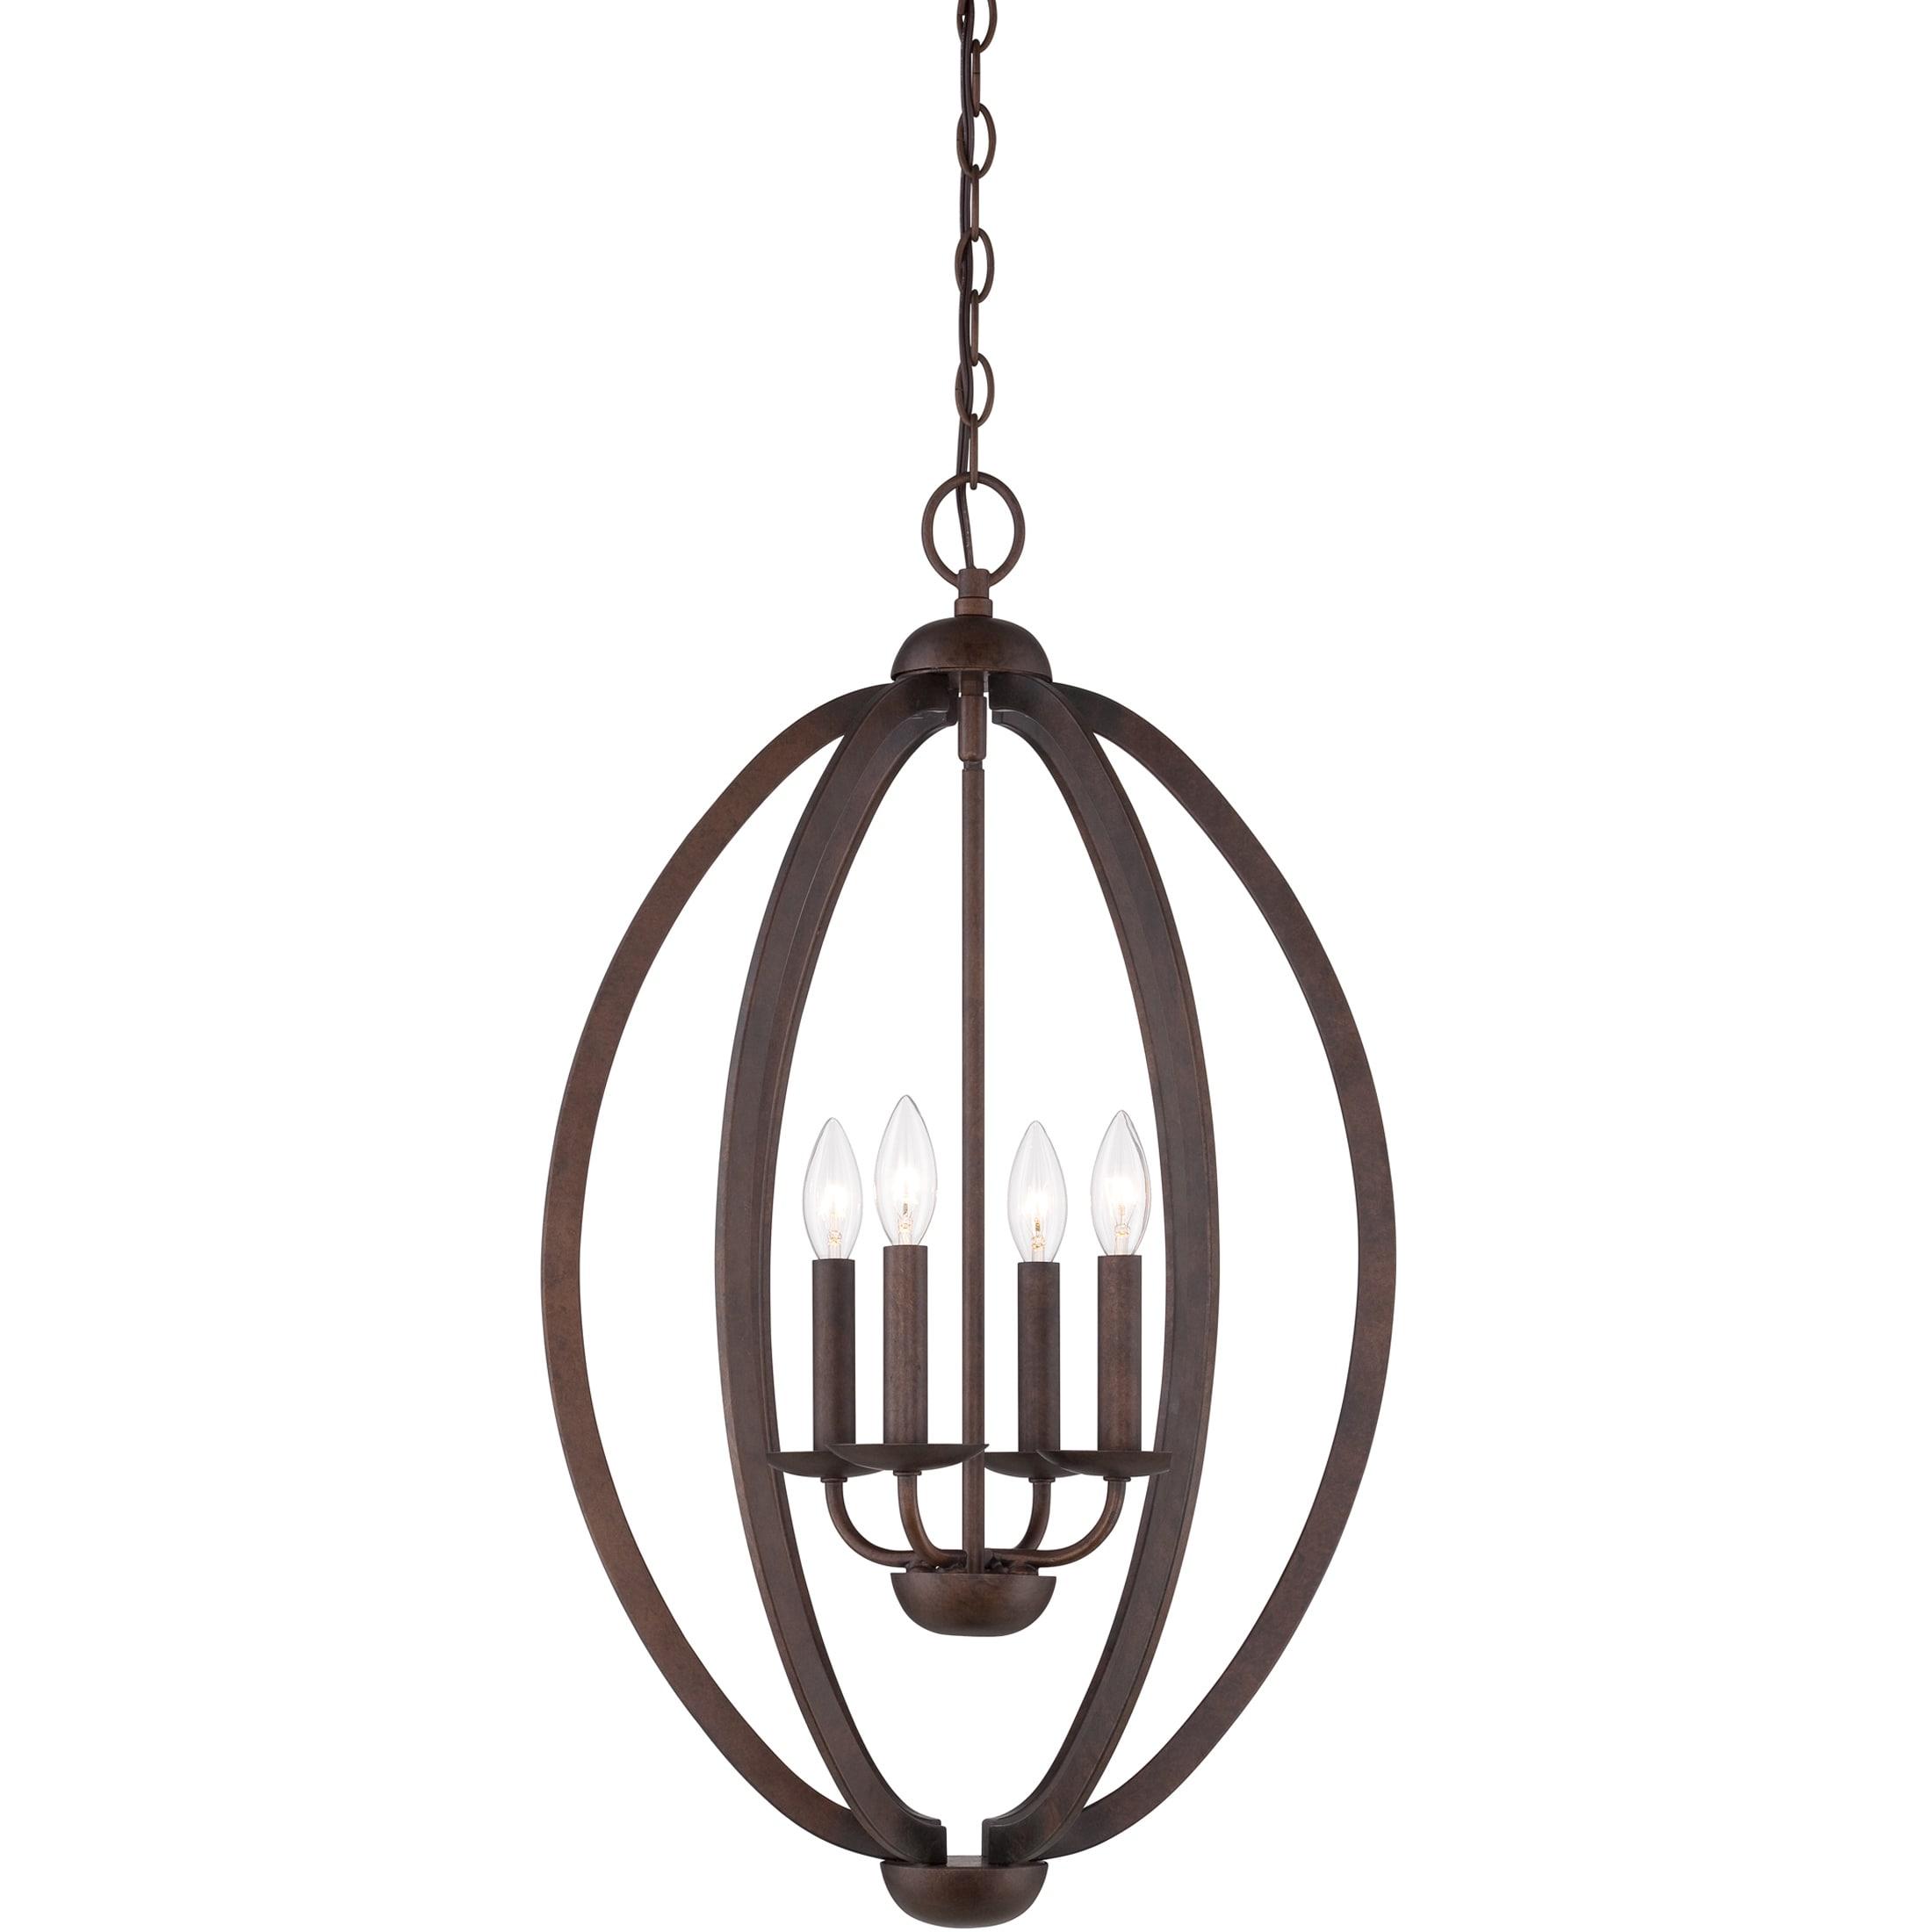 Quoizel Fixture 4 light Museum Bronze Cage Chandelier Free